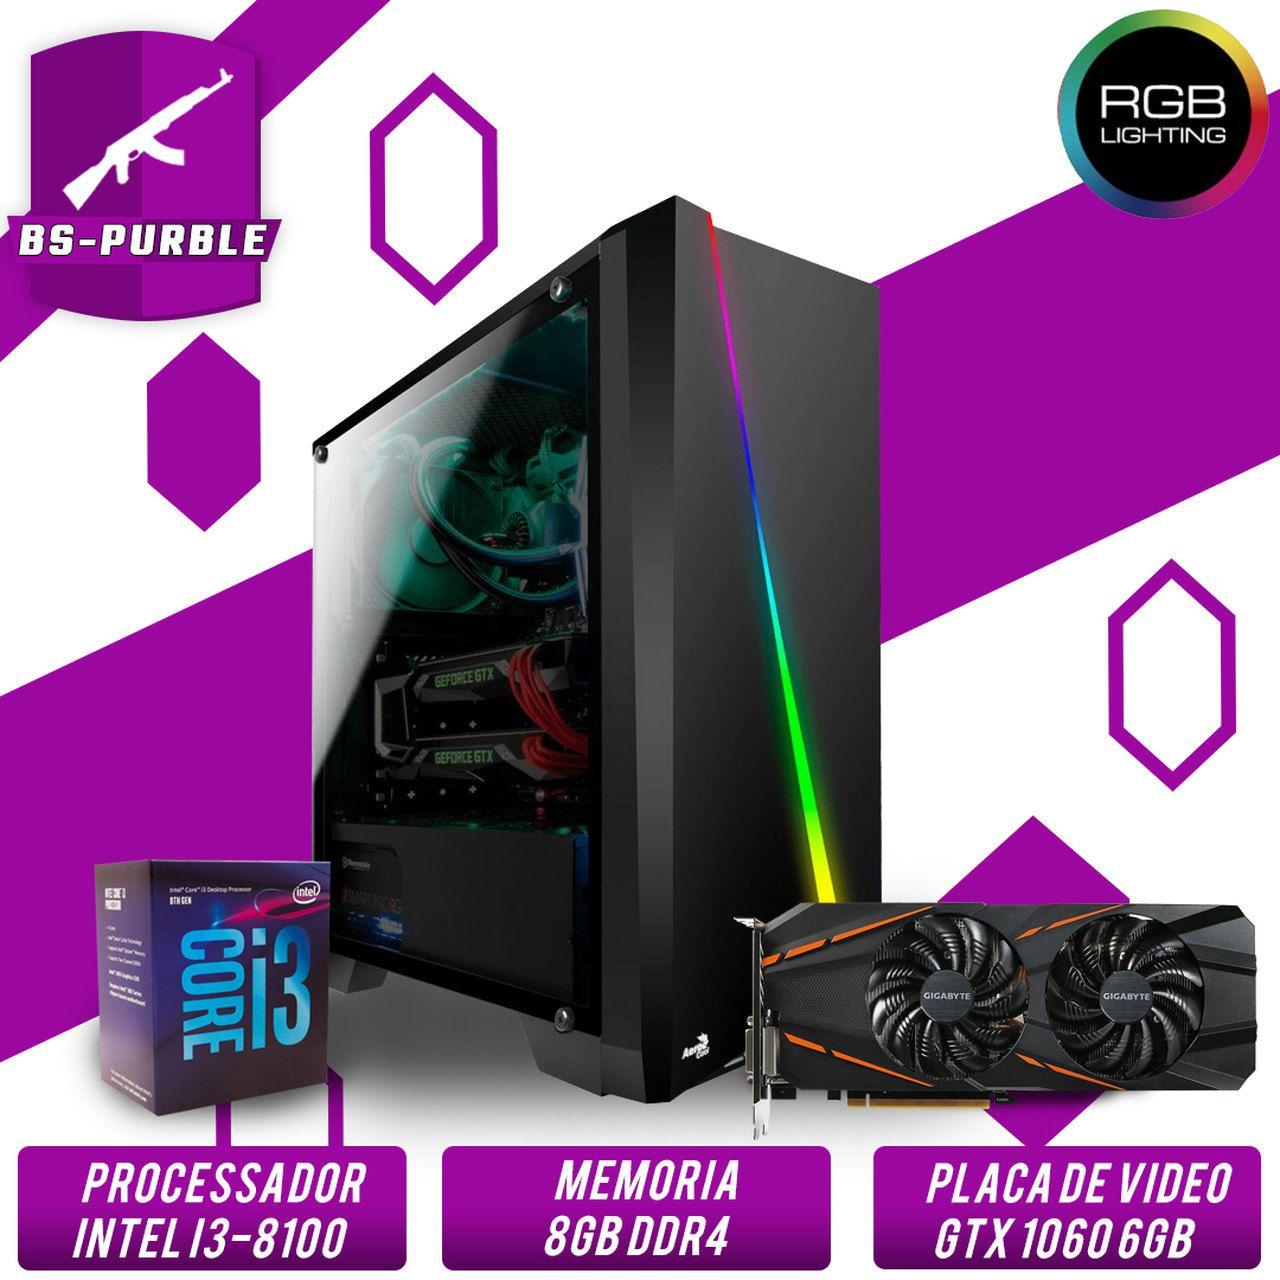 Computador Gamer Intel I3 9100F 3.6GHZ 8MB, 8GB DDR4, HD 1TB, 500W, GTX 1060 6GB Super